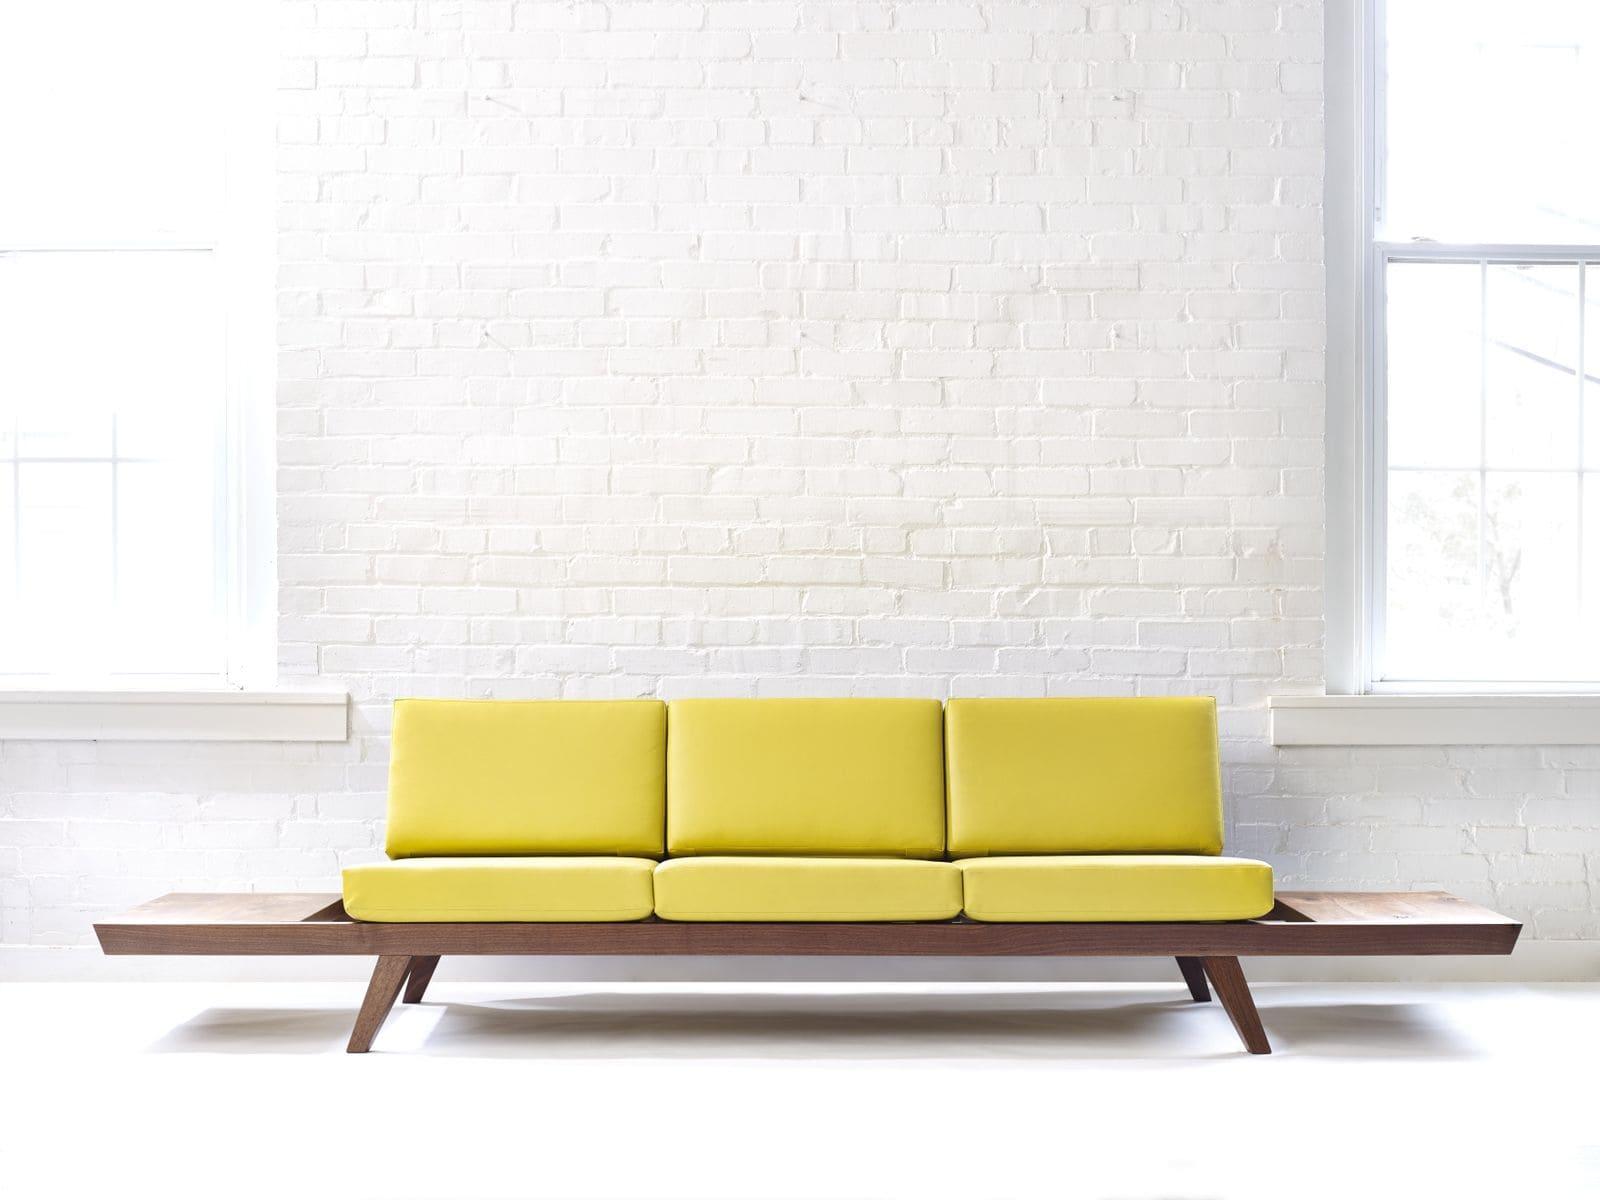 canapé jaune design